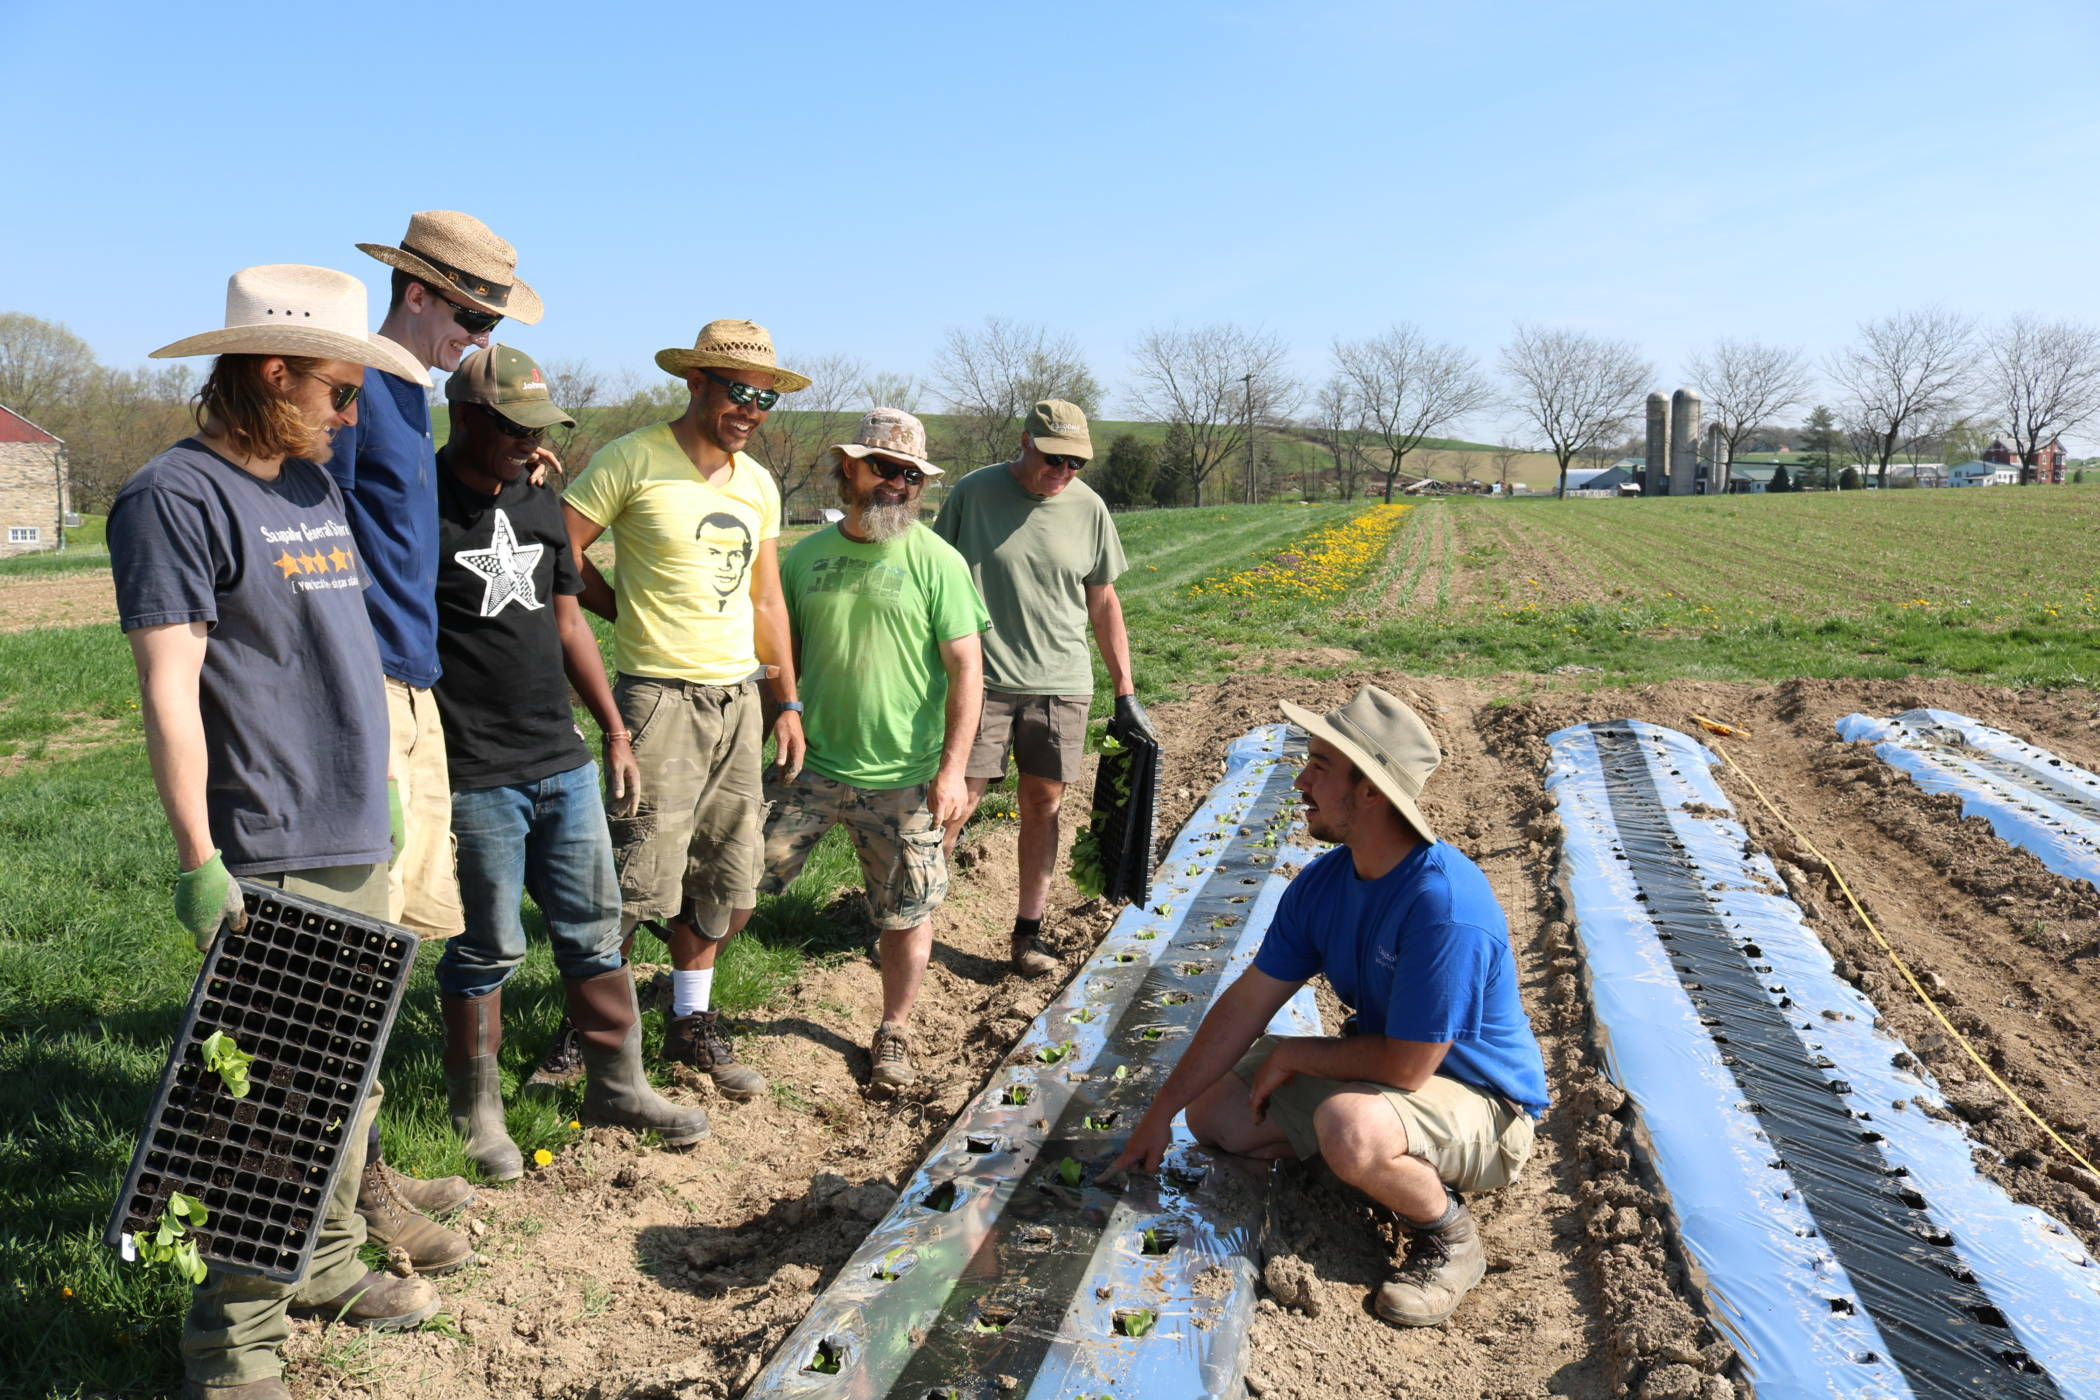 Farm trainees learning in the field